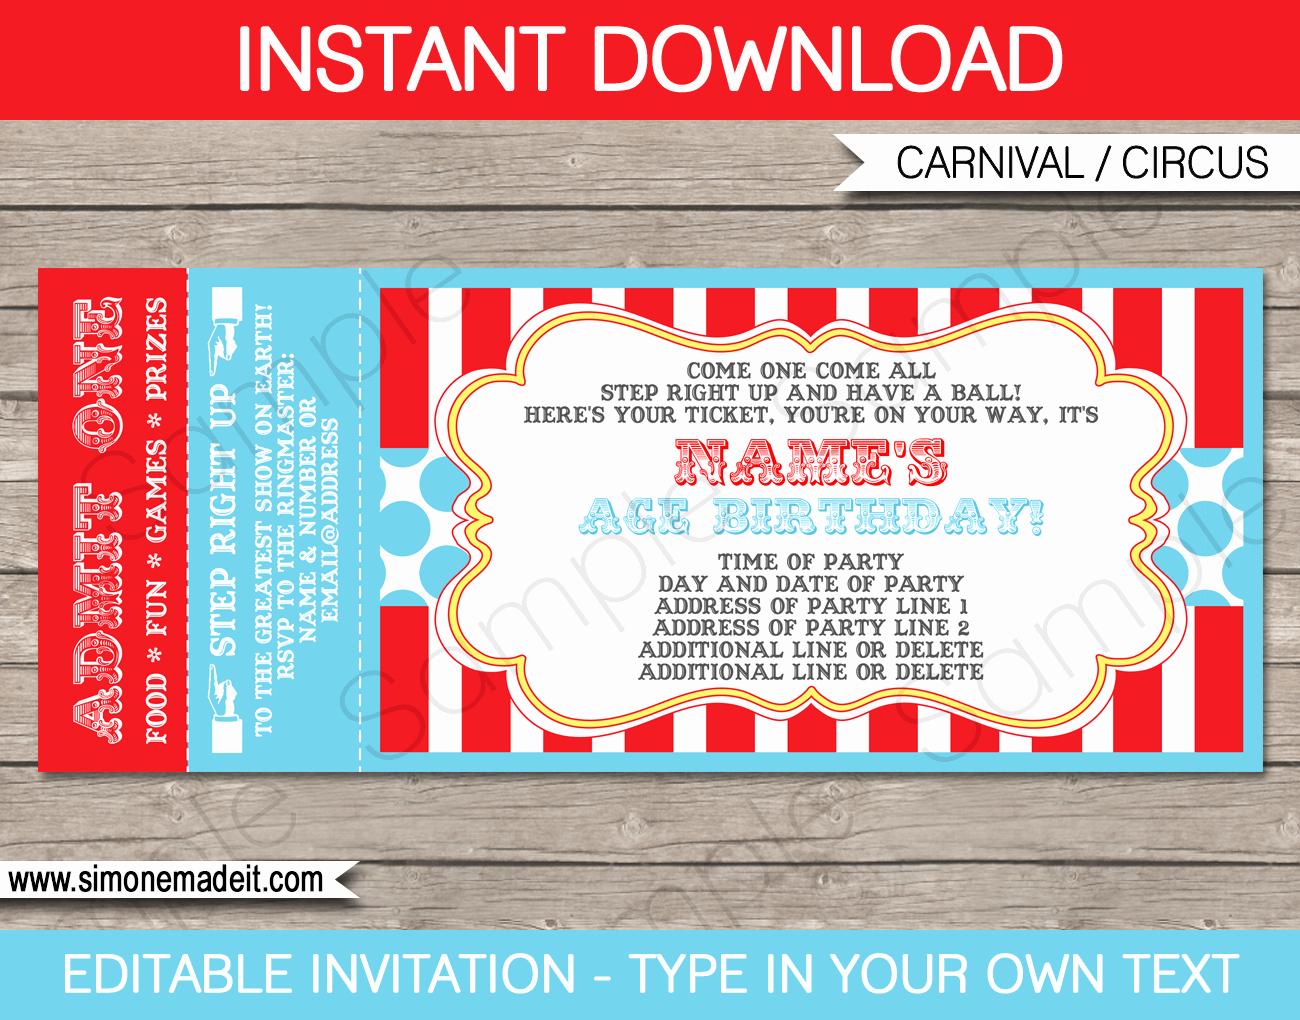 Admission Ticket Invitation Template Free Awesome Circus Ticket Invitation Template